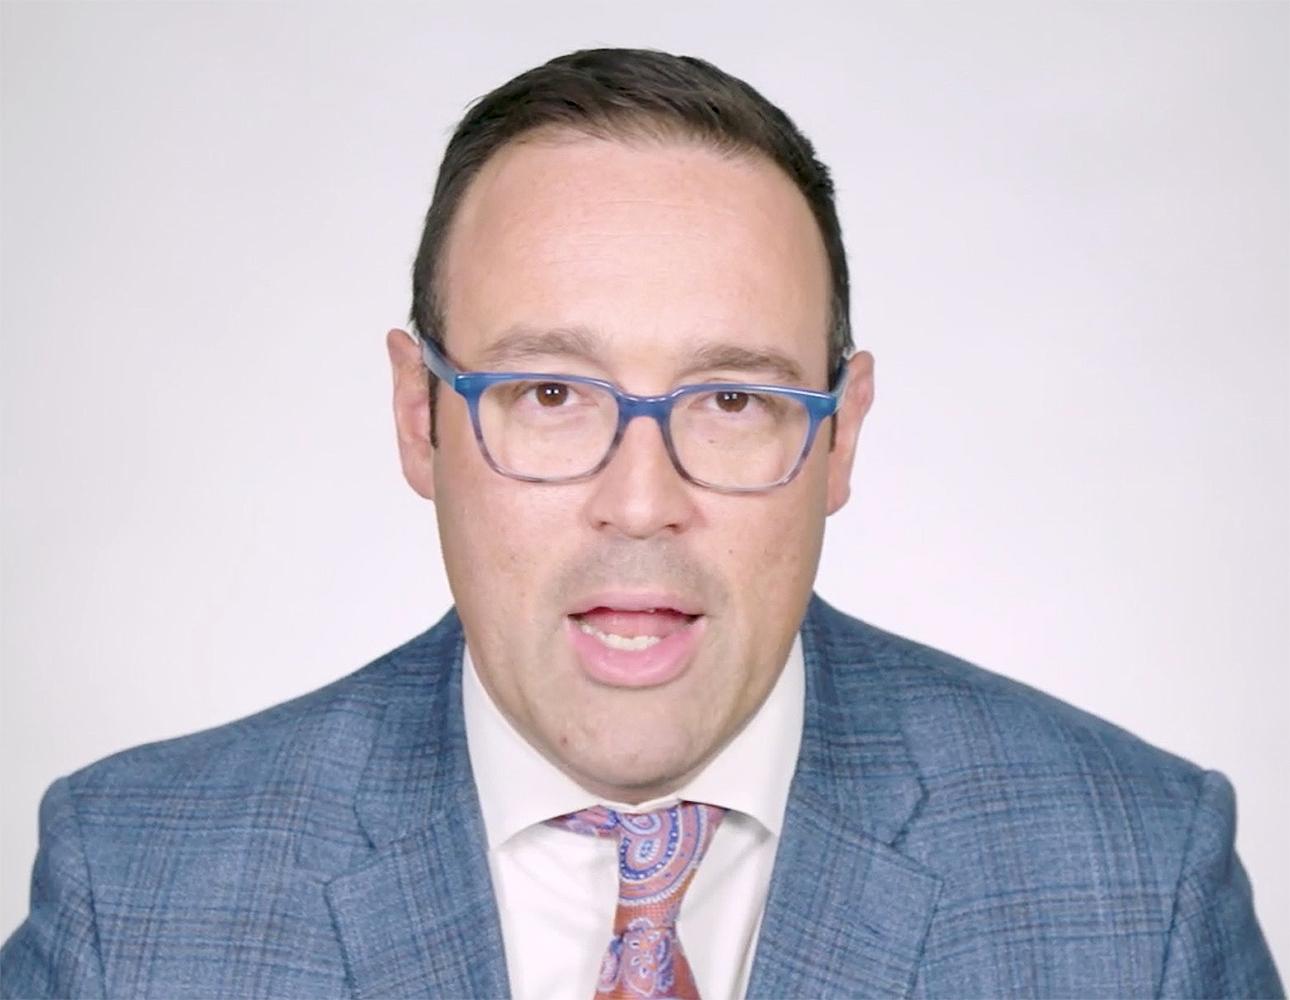 CNN Politics Reporter and Editor-at-Large Chris Cillizza